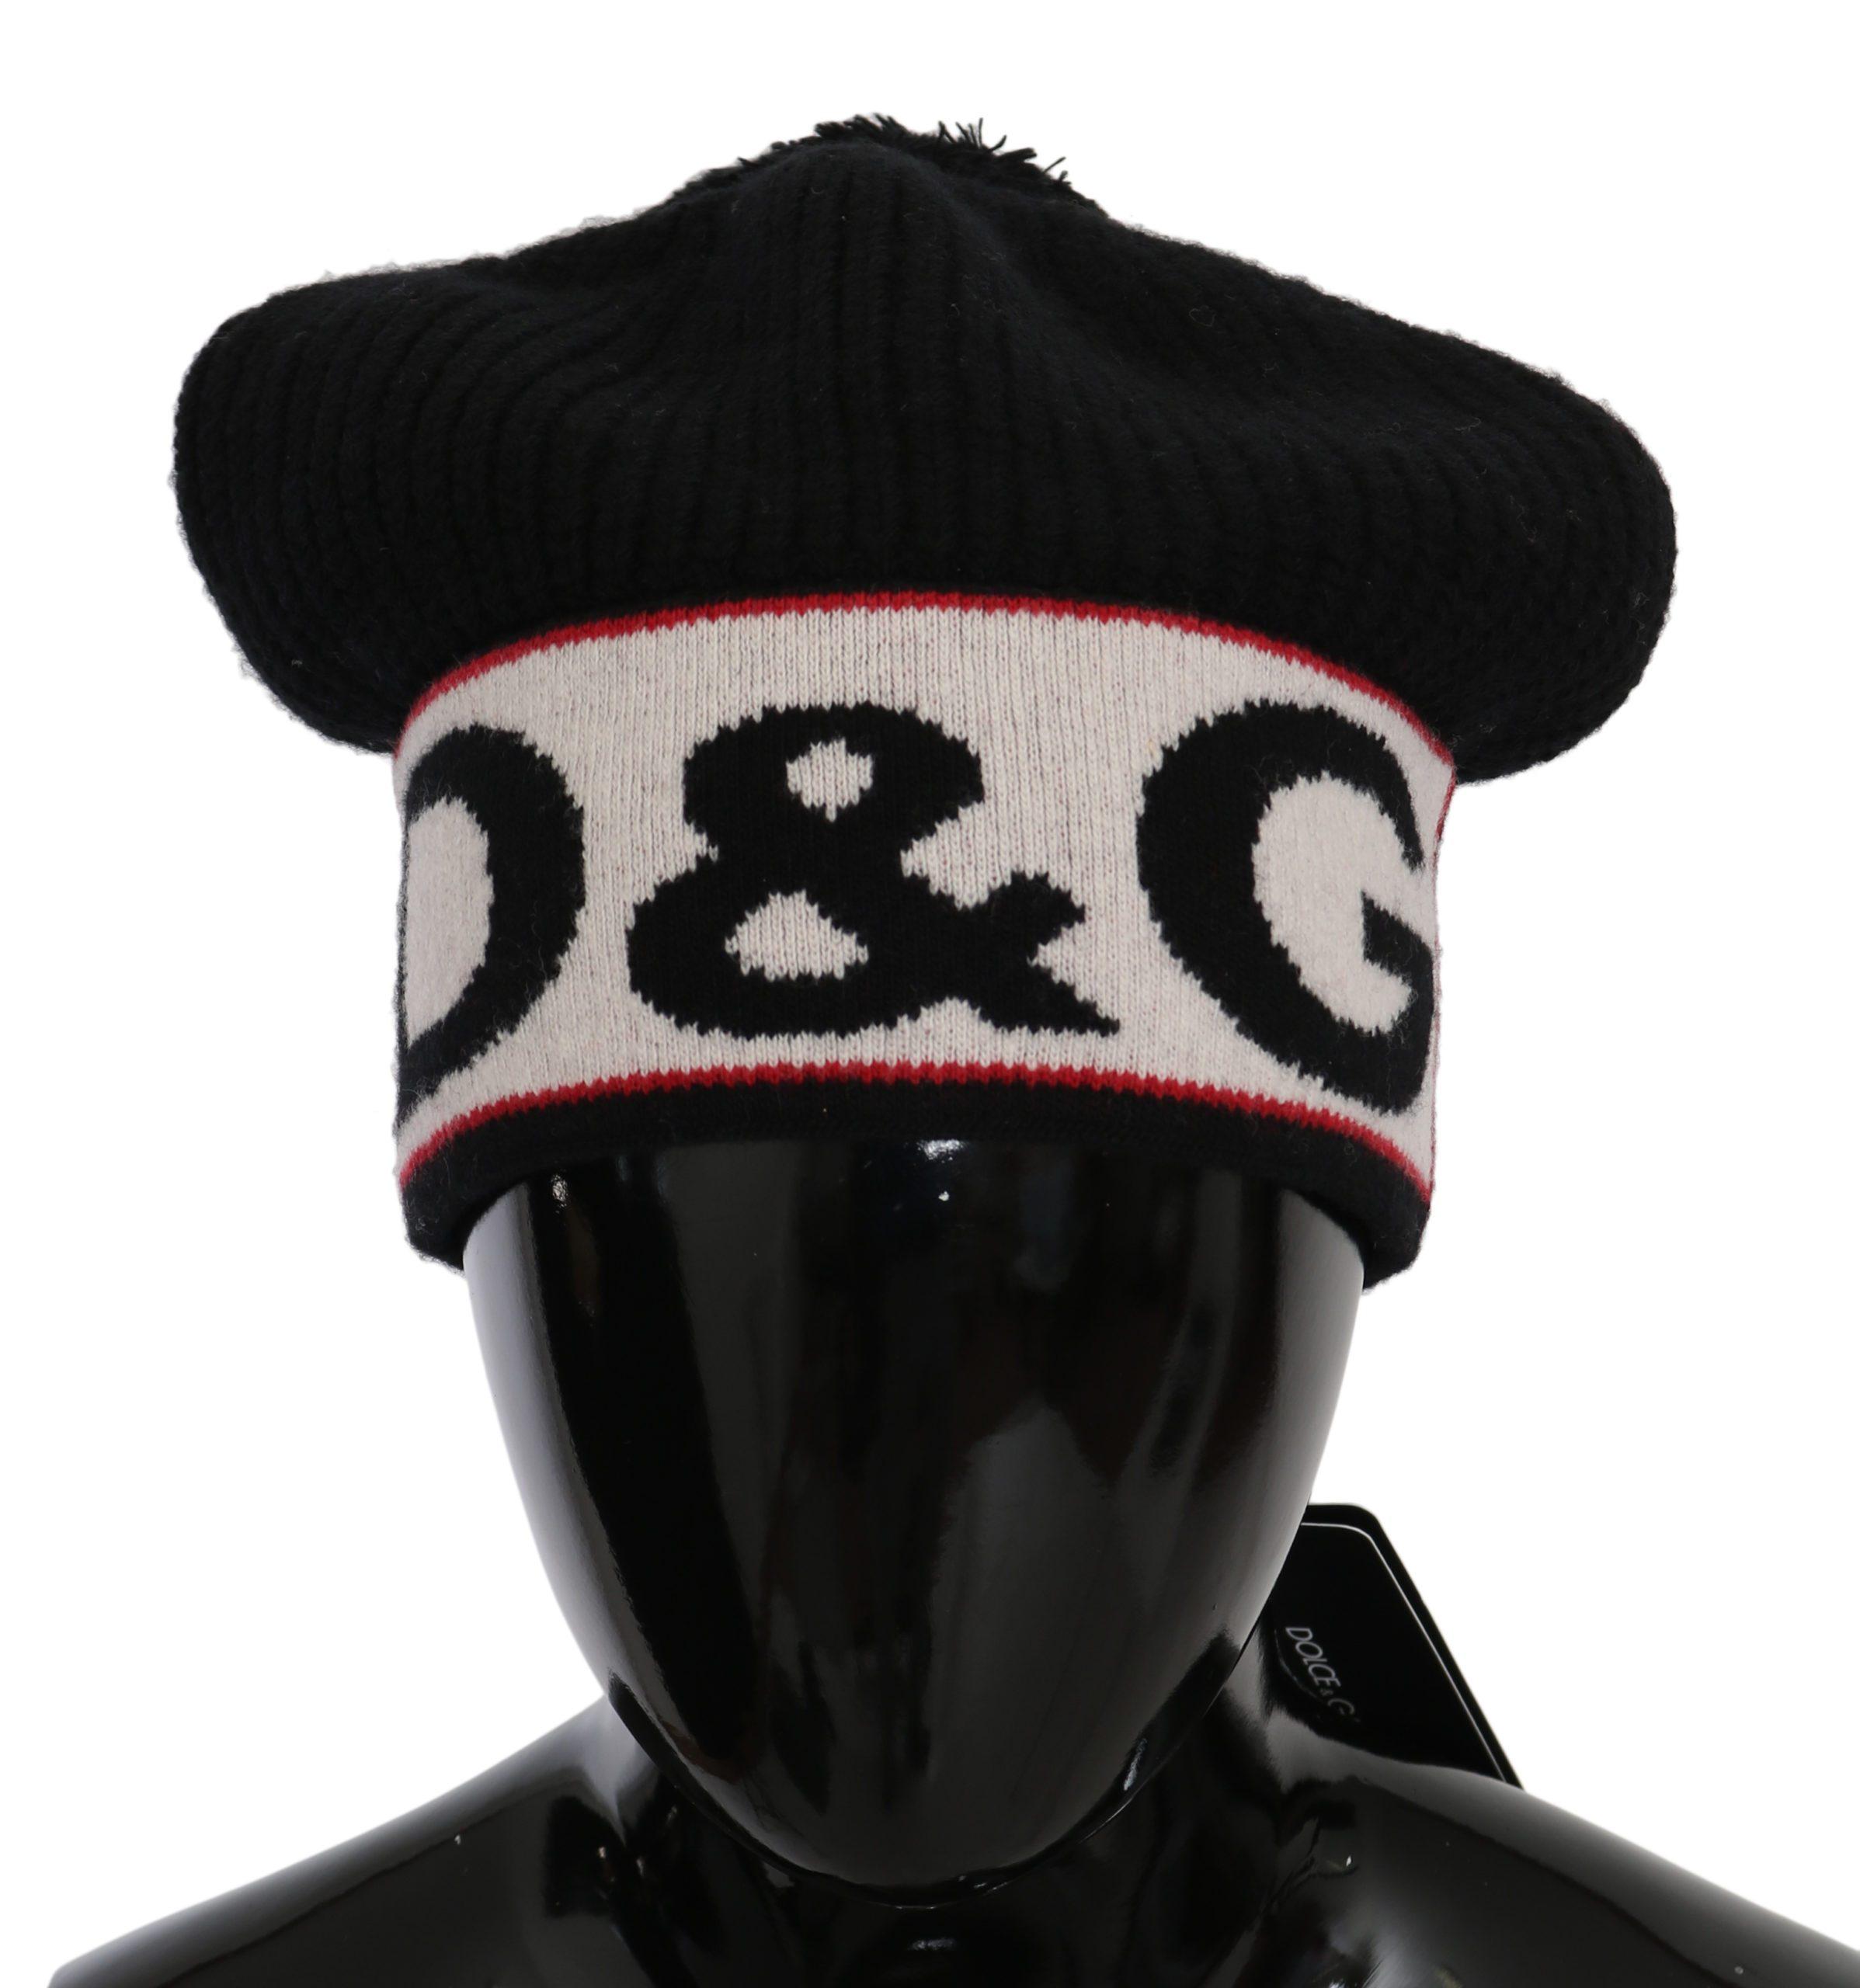 Dolce & Gabbana Men's Virgin Wool Knitted Beanie Hat Black 294208460067